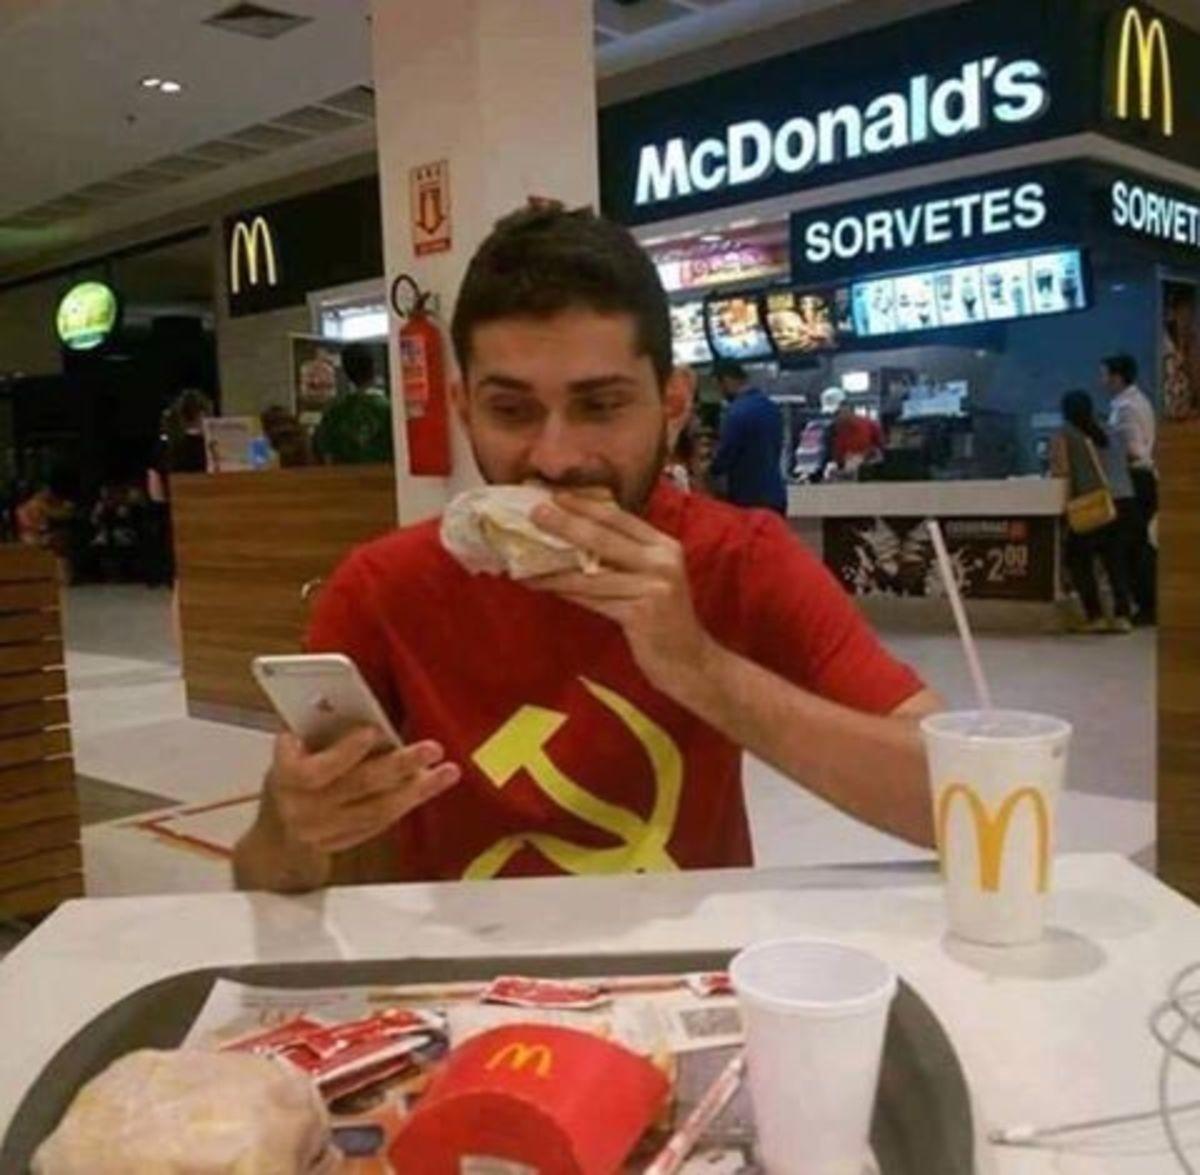 mcdonalds, communist, ideologies